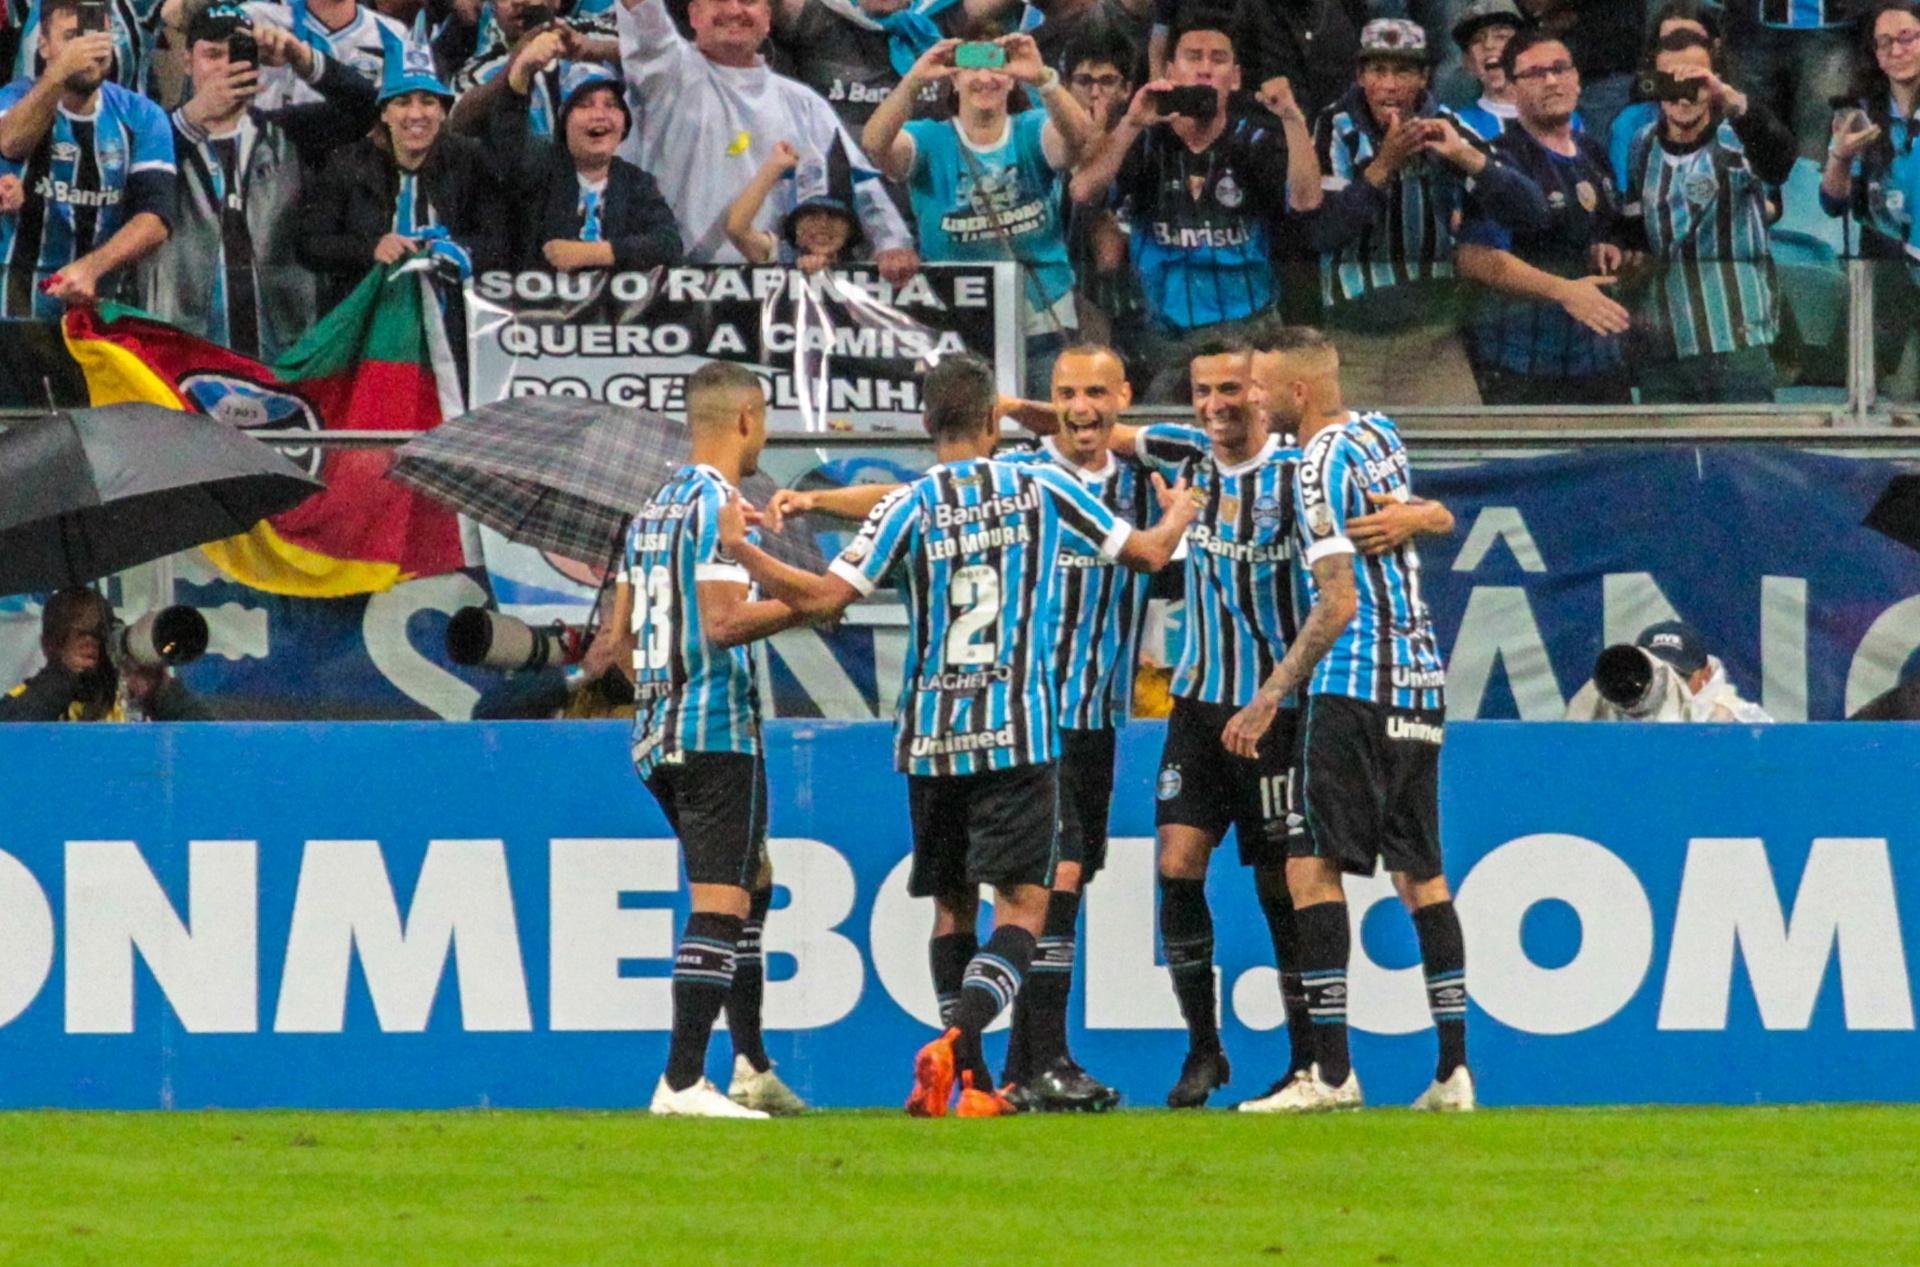 Grêmio goleia Tucumán e pega River Plate na semi da Libertadores - Esporte  - BOL 604bea1f1a840